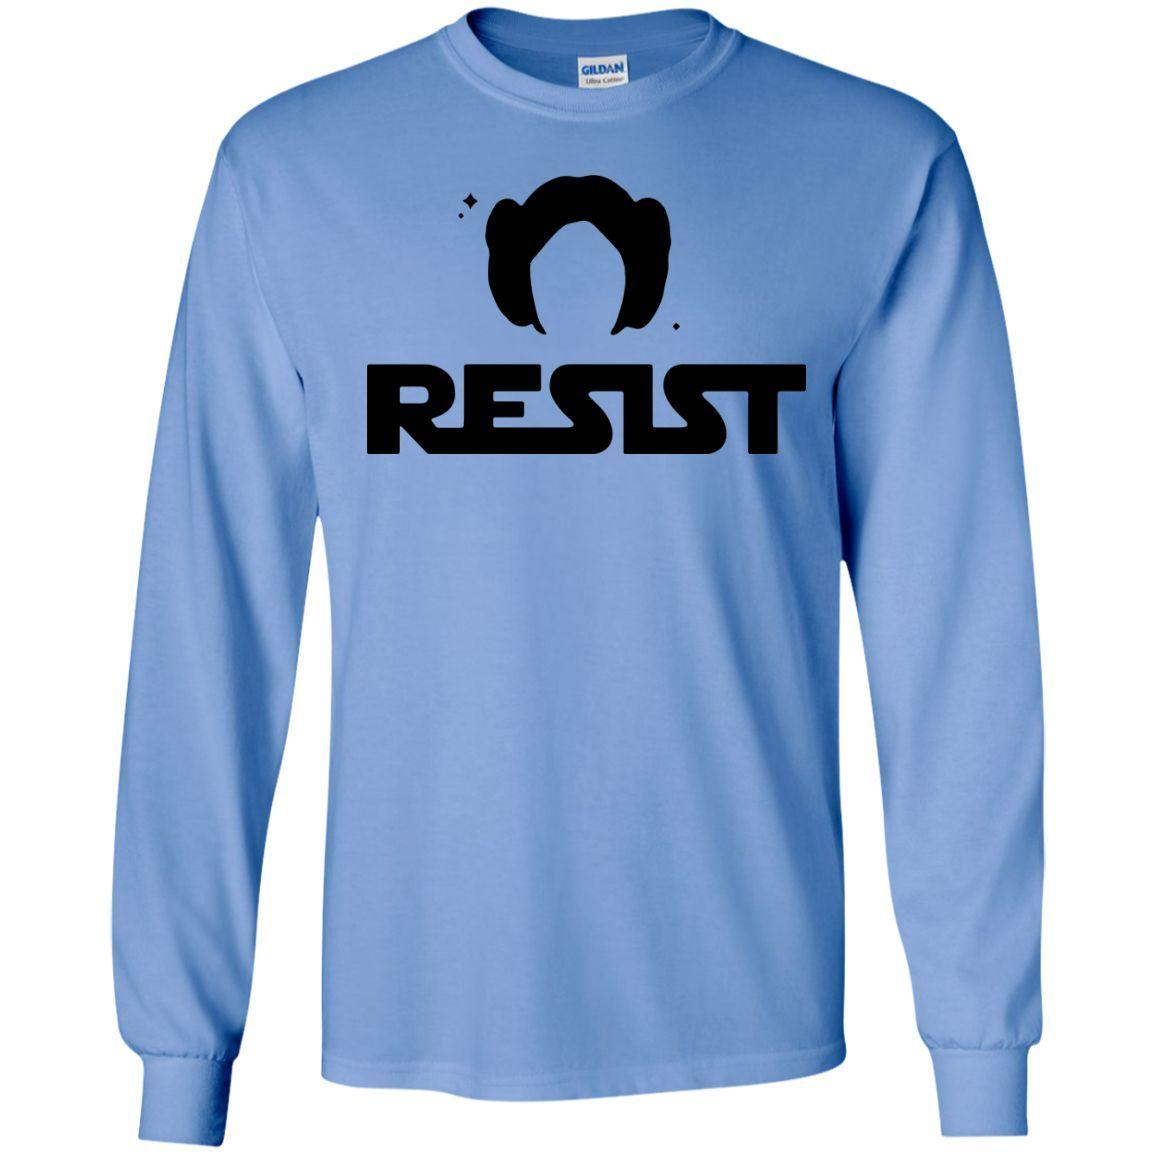 Resist -Rebel Nasty Woman Anti-Trump LS Tshirt - Teeever.com